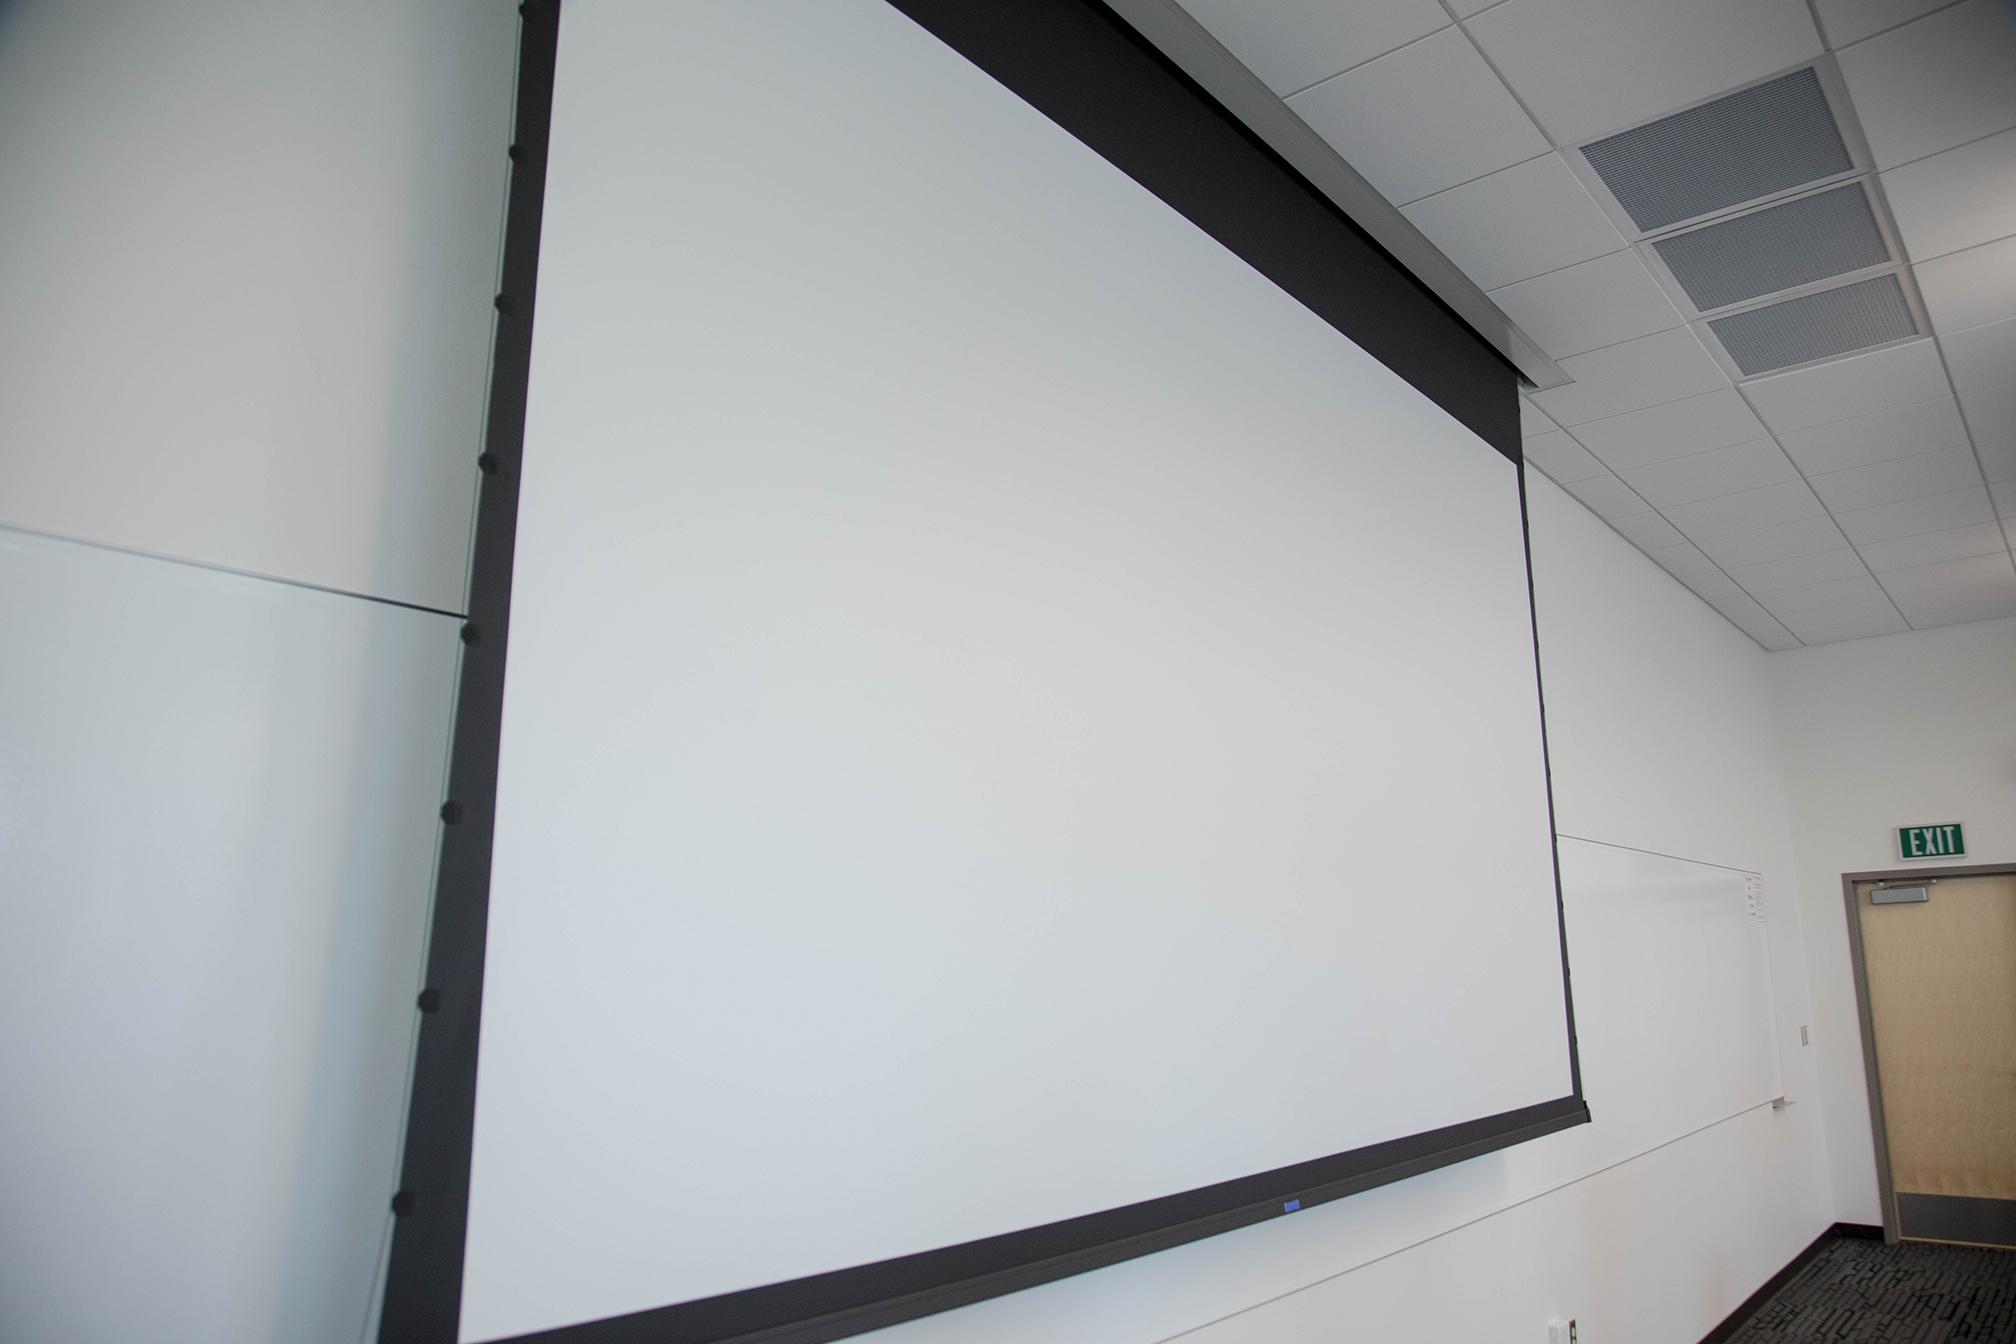 DCB 235 Projector screen